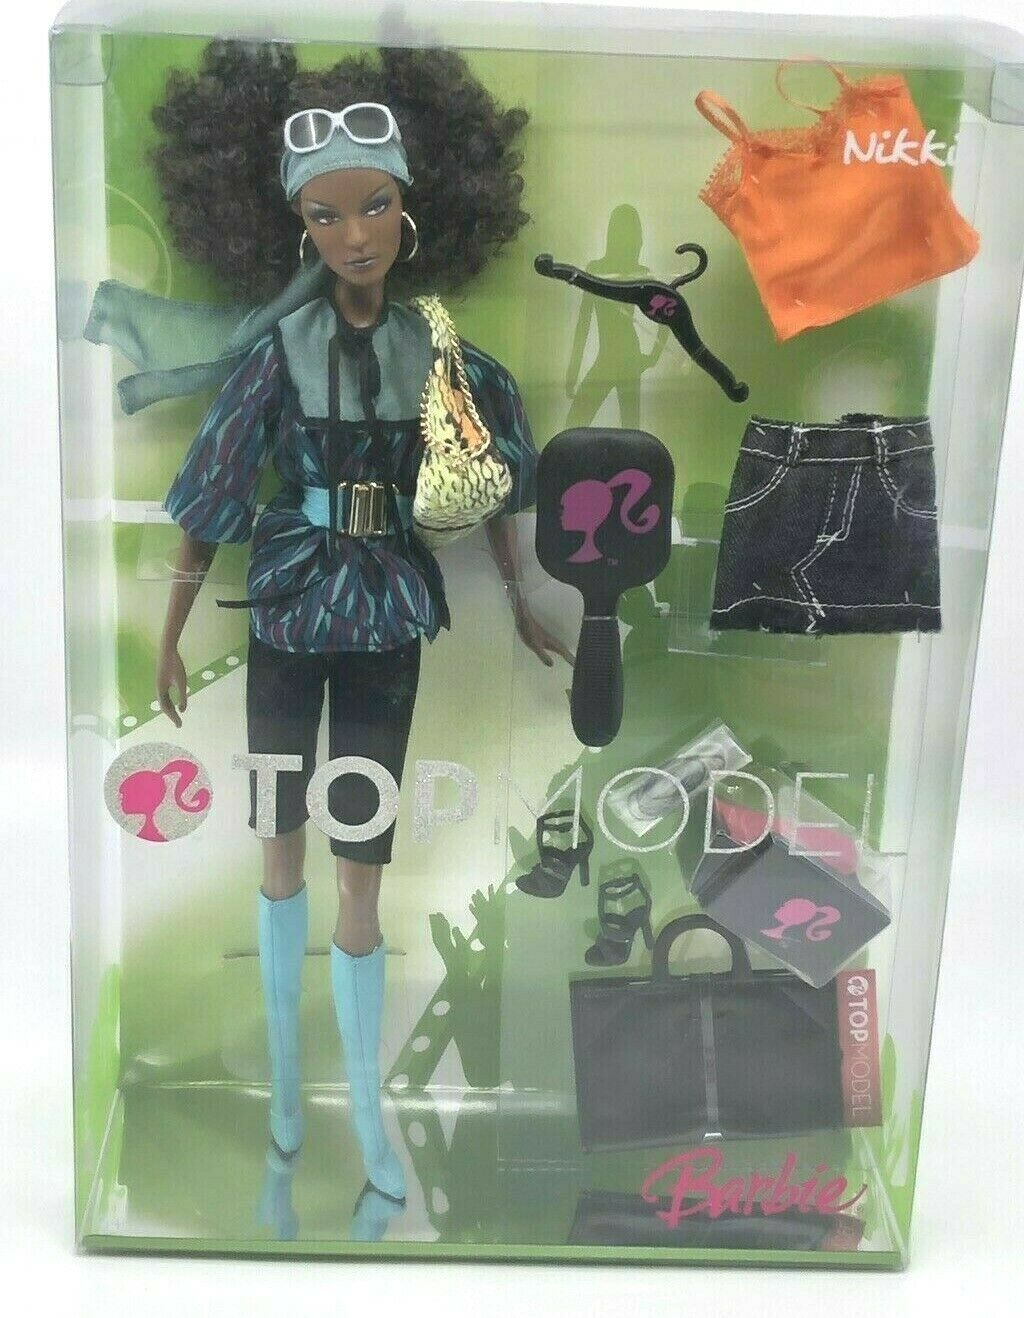 MATTEL Barbie Dreamhouse avventura Afro Nikki Doll-Libero /& veloce SHIPP